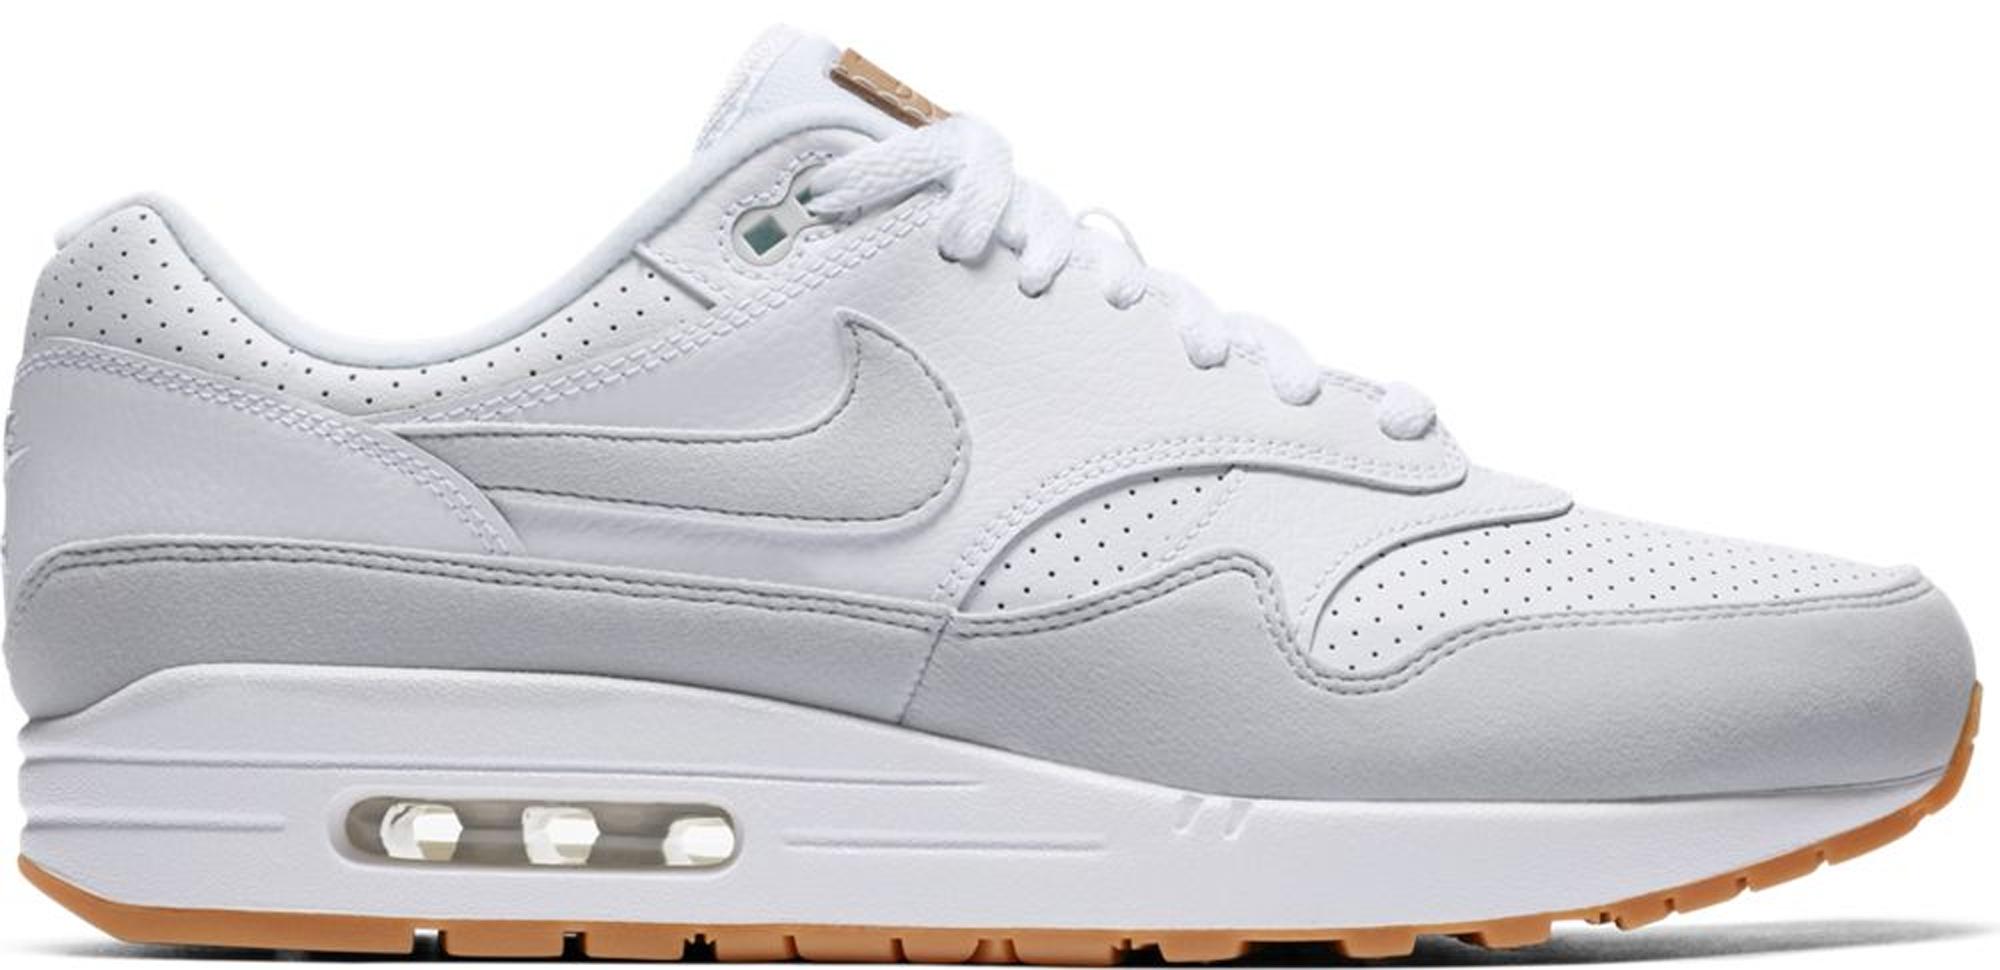 Nike Air Max 1 White Platinum Gum